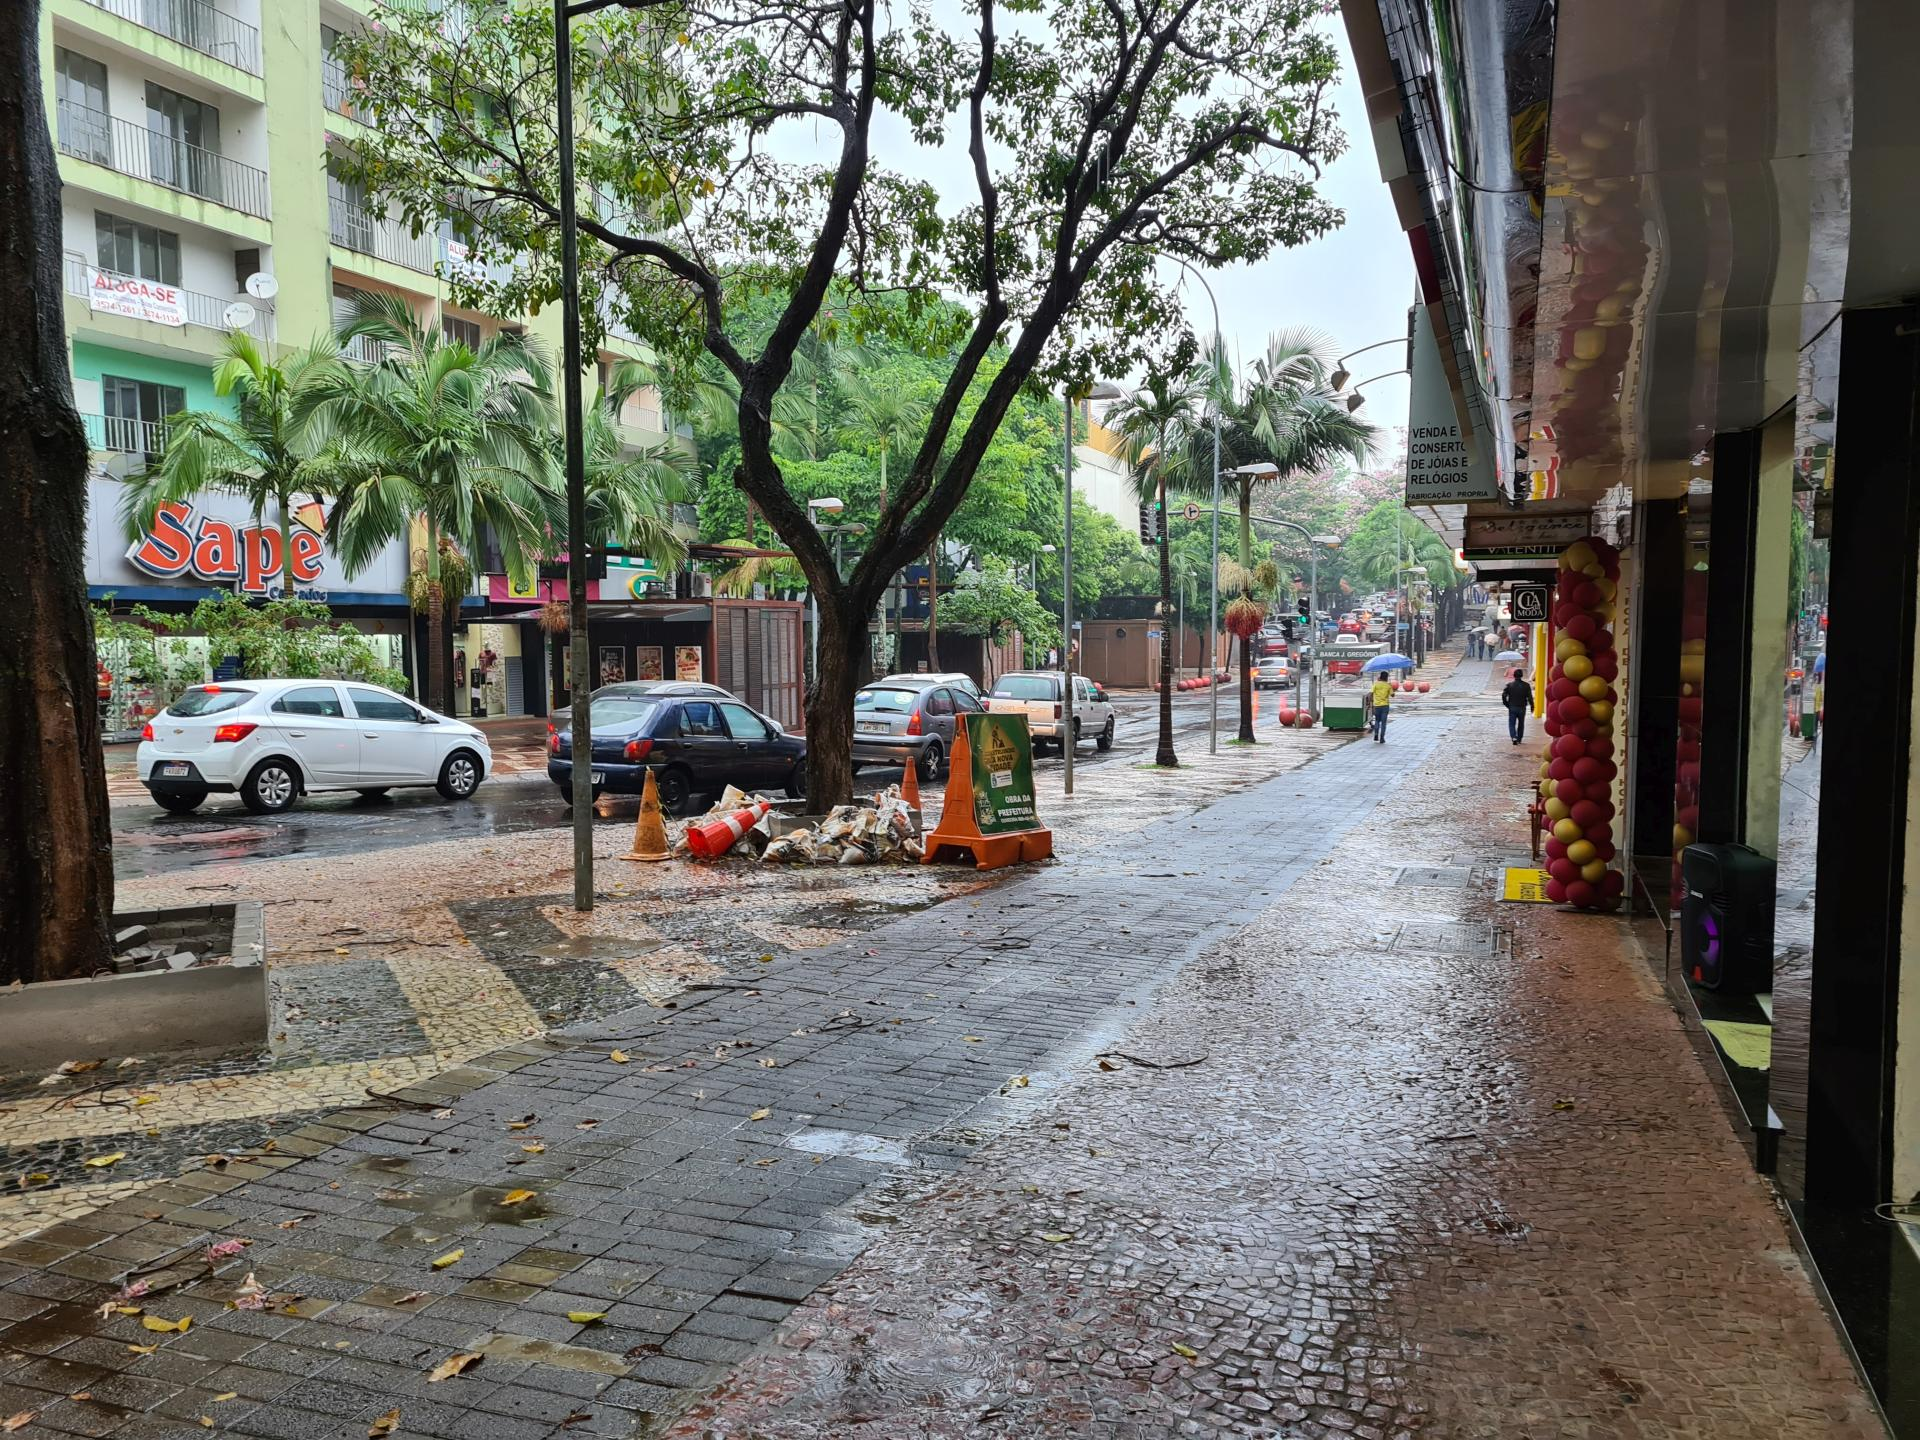 улицы города Фоз-ду-Игуасу